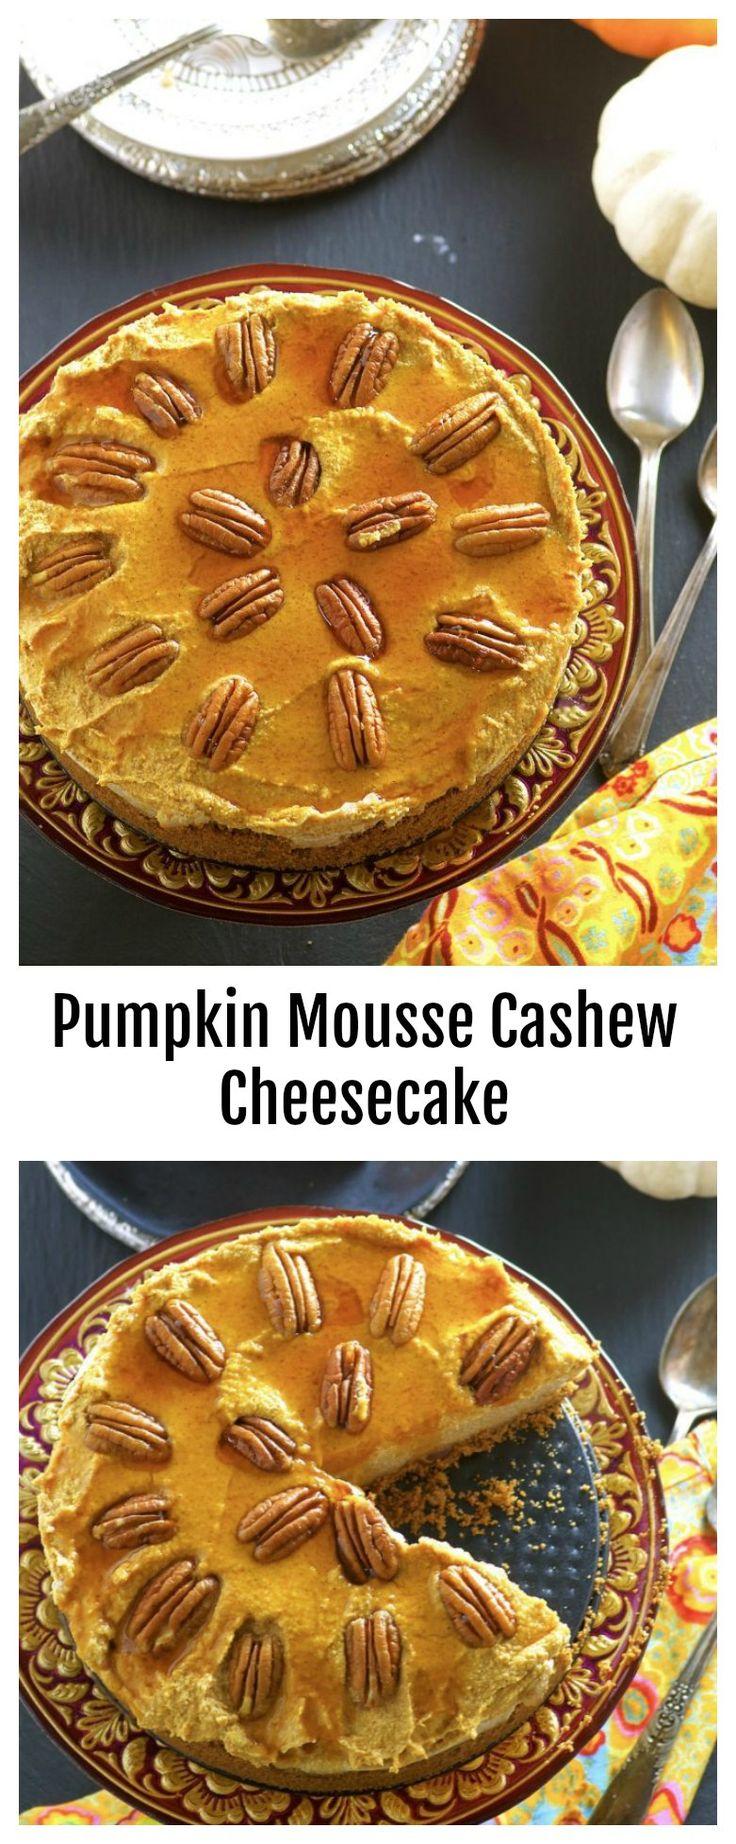 This No-Bake Pumpkin Mousse Cashew Cheesecake has…